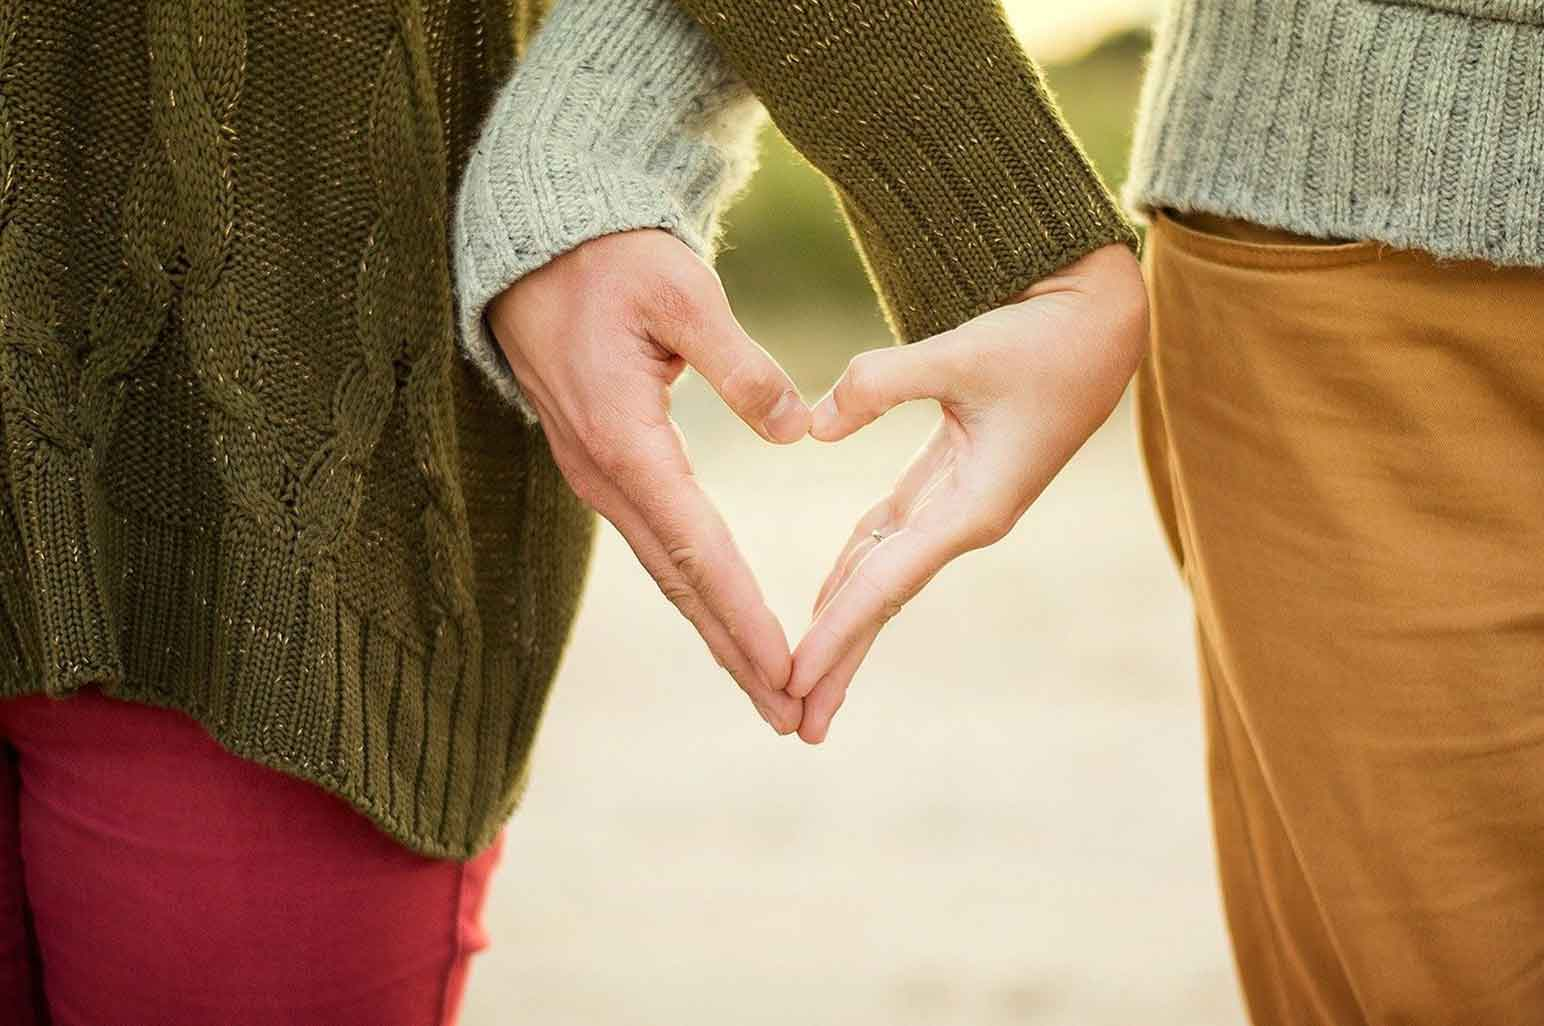 Reasons Why Some Men Prefer Older Women